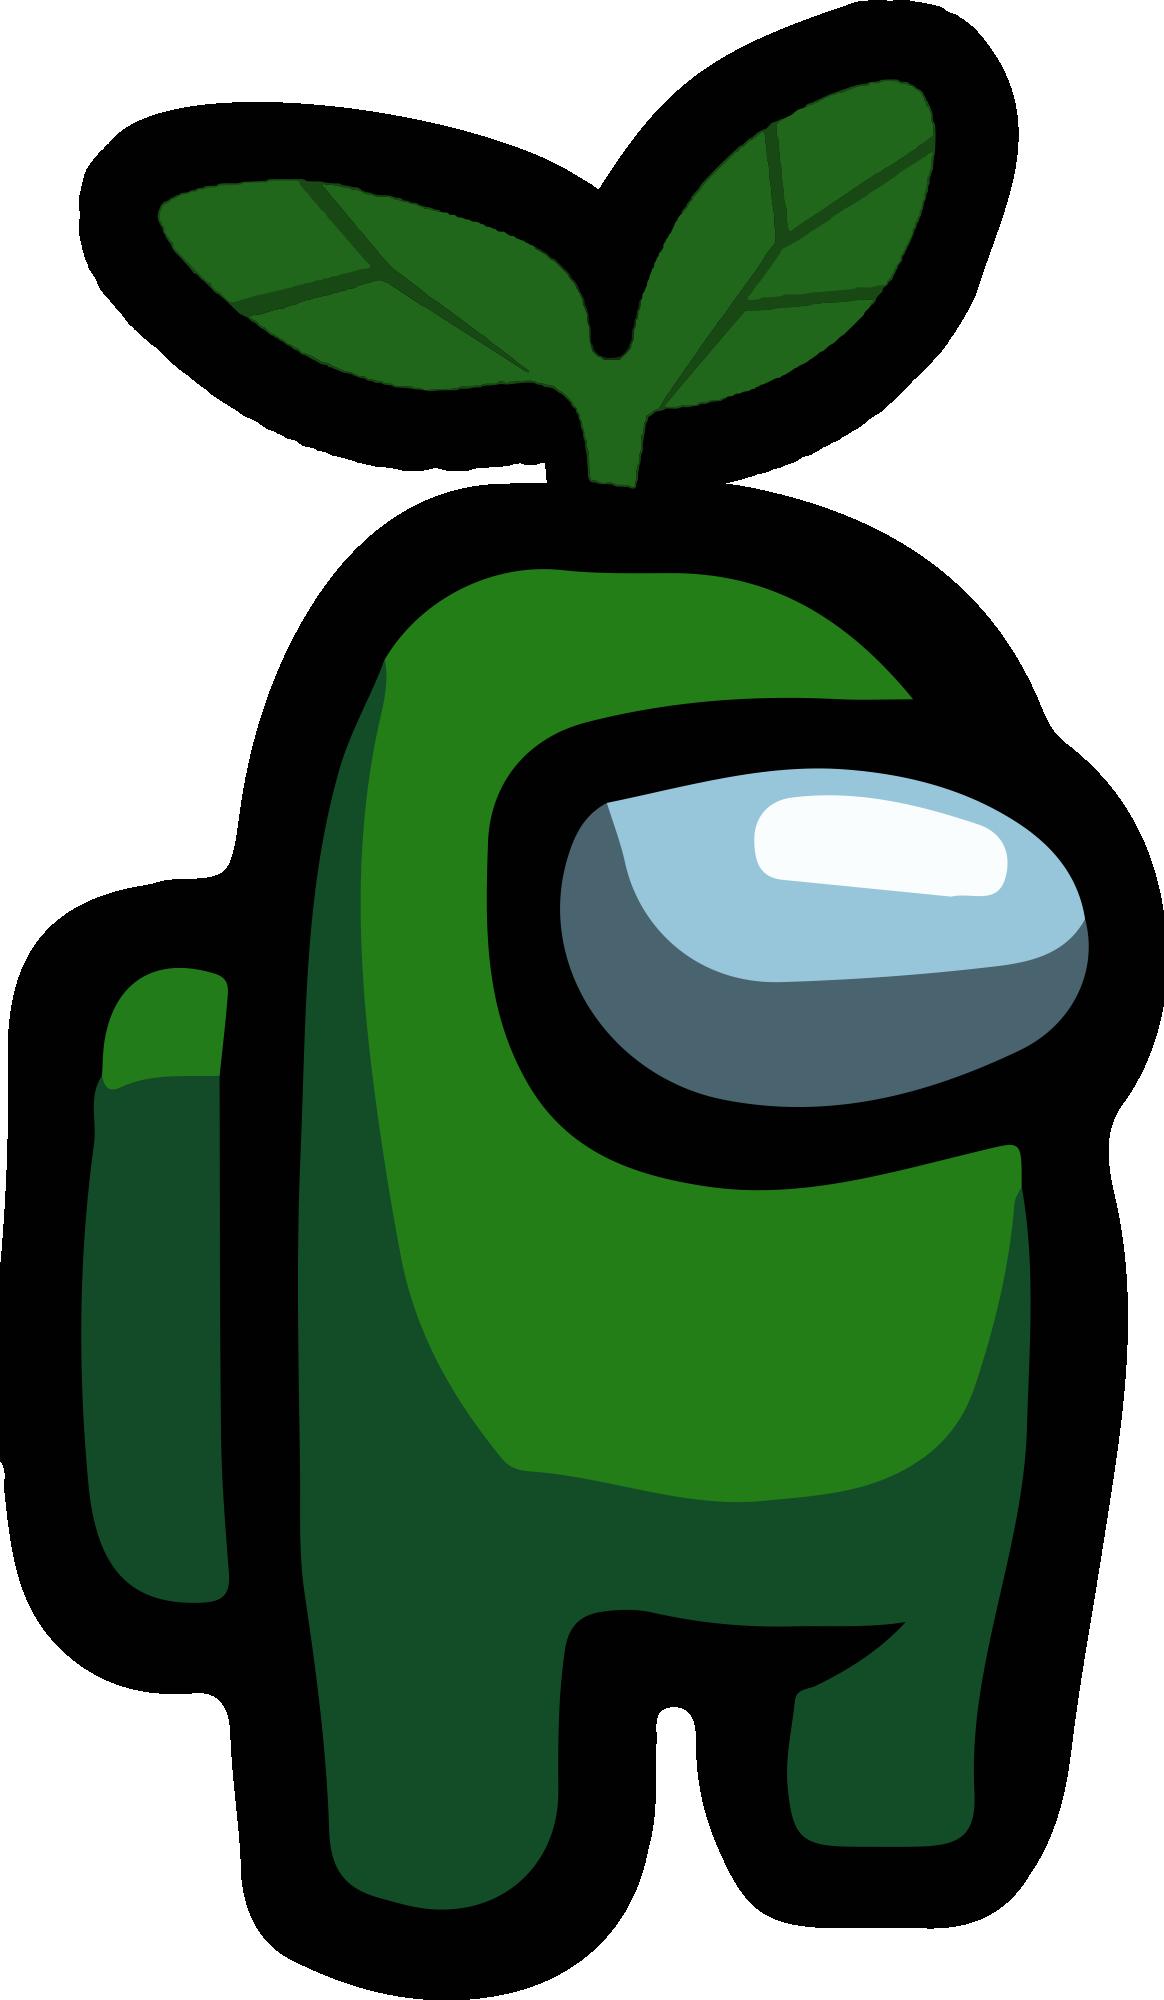 Among Us - Green Leaf Hat PNG 01